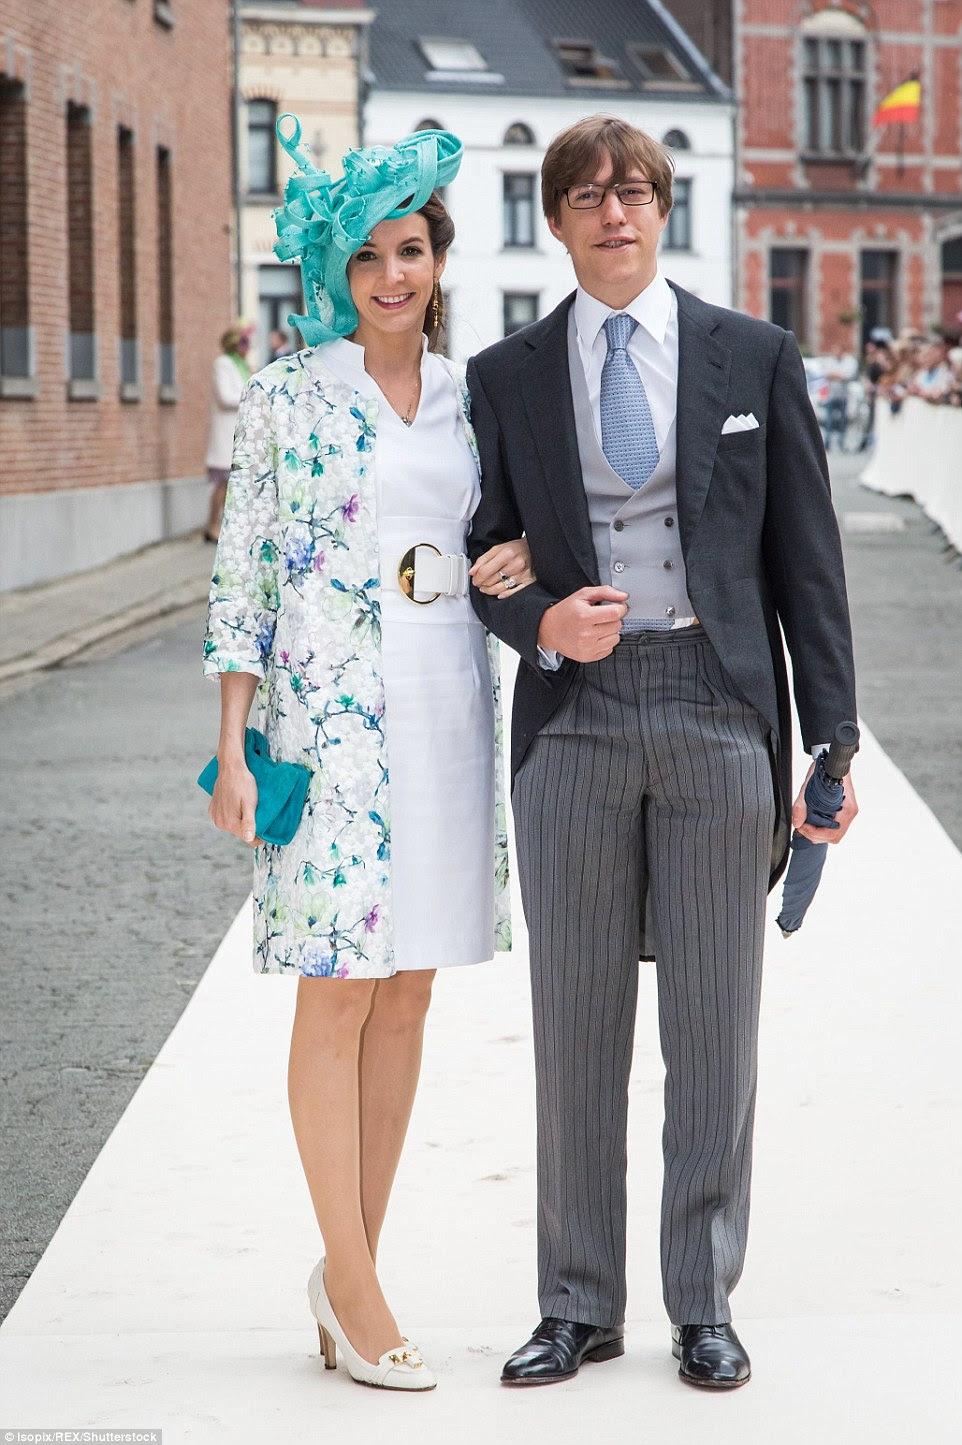 Principe  Louis de Luxemburgo e Princesa Tessy posam no tapete branco na rua